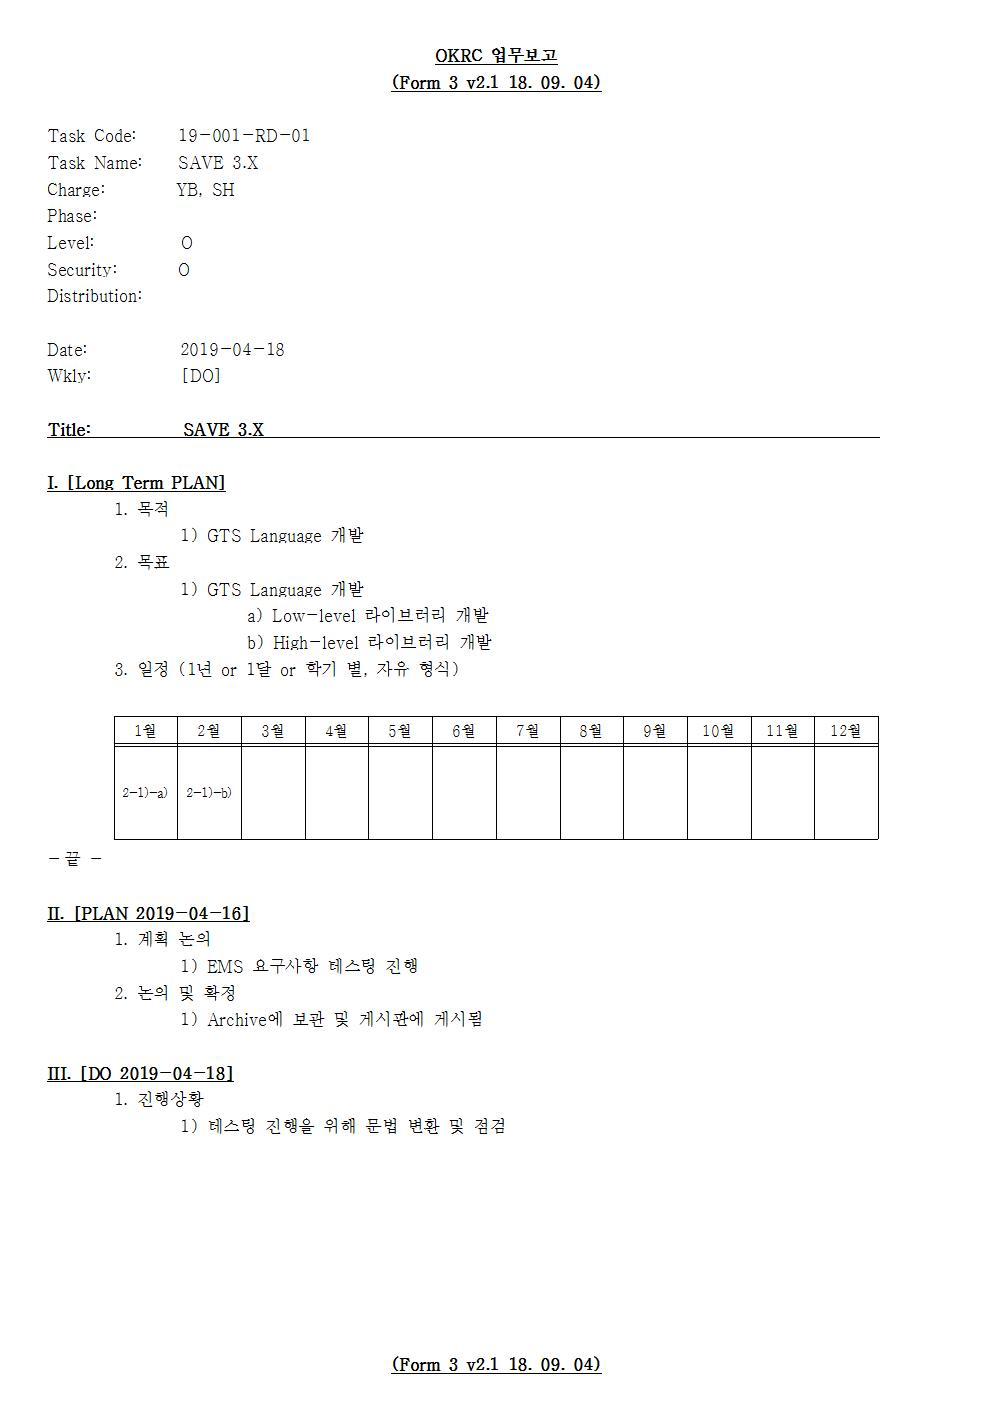 D-[19-001-RD-01]-[SAVE 3.X]-[2019-04-18][SH]001.jpg